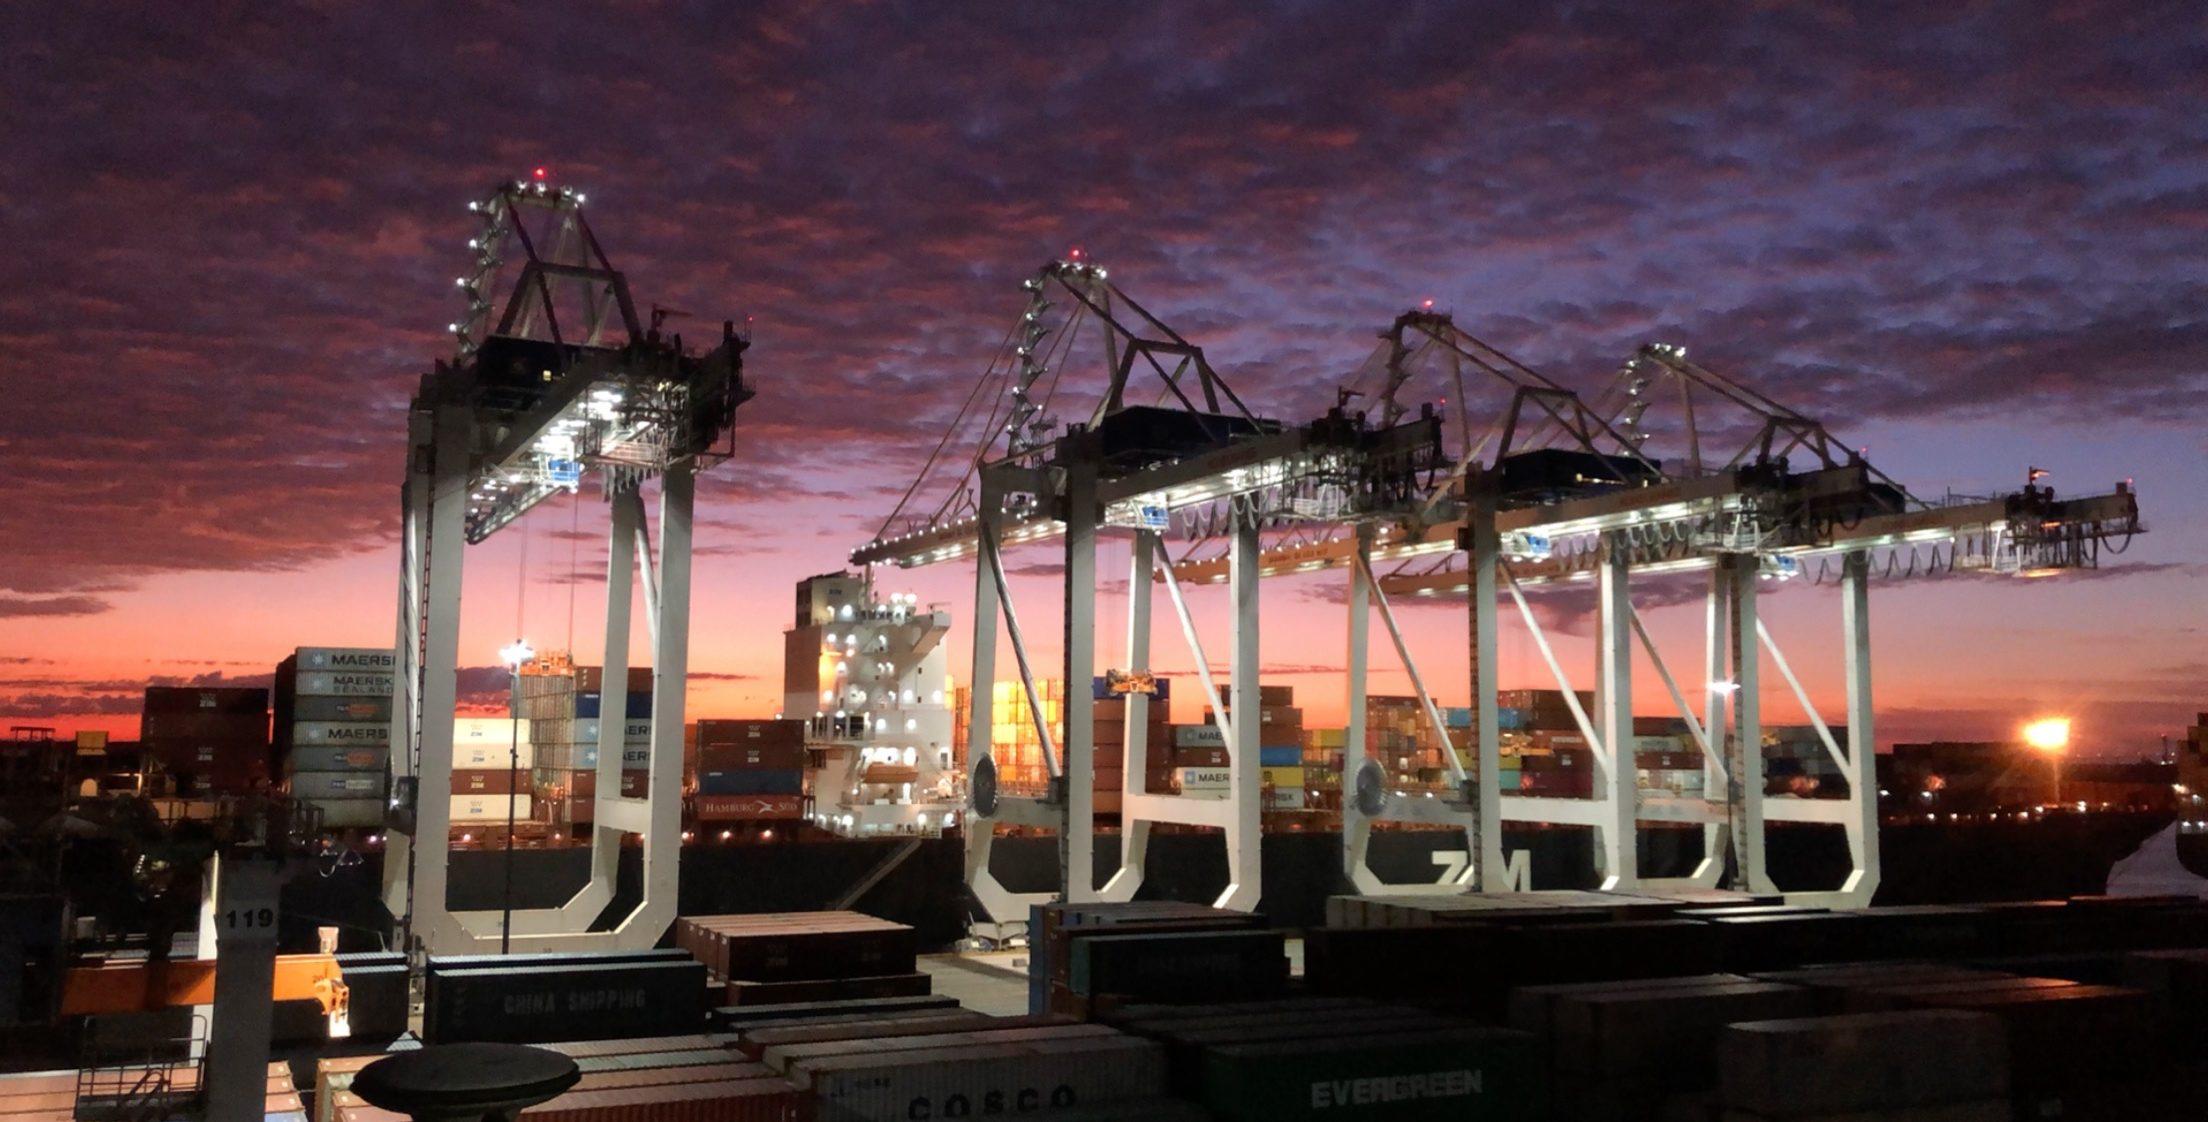 McLaren Containers